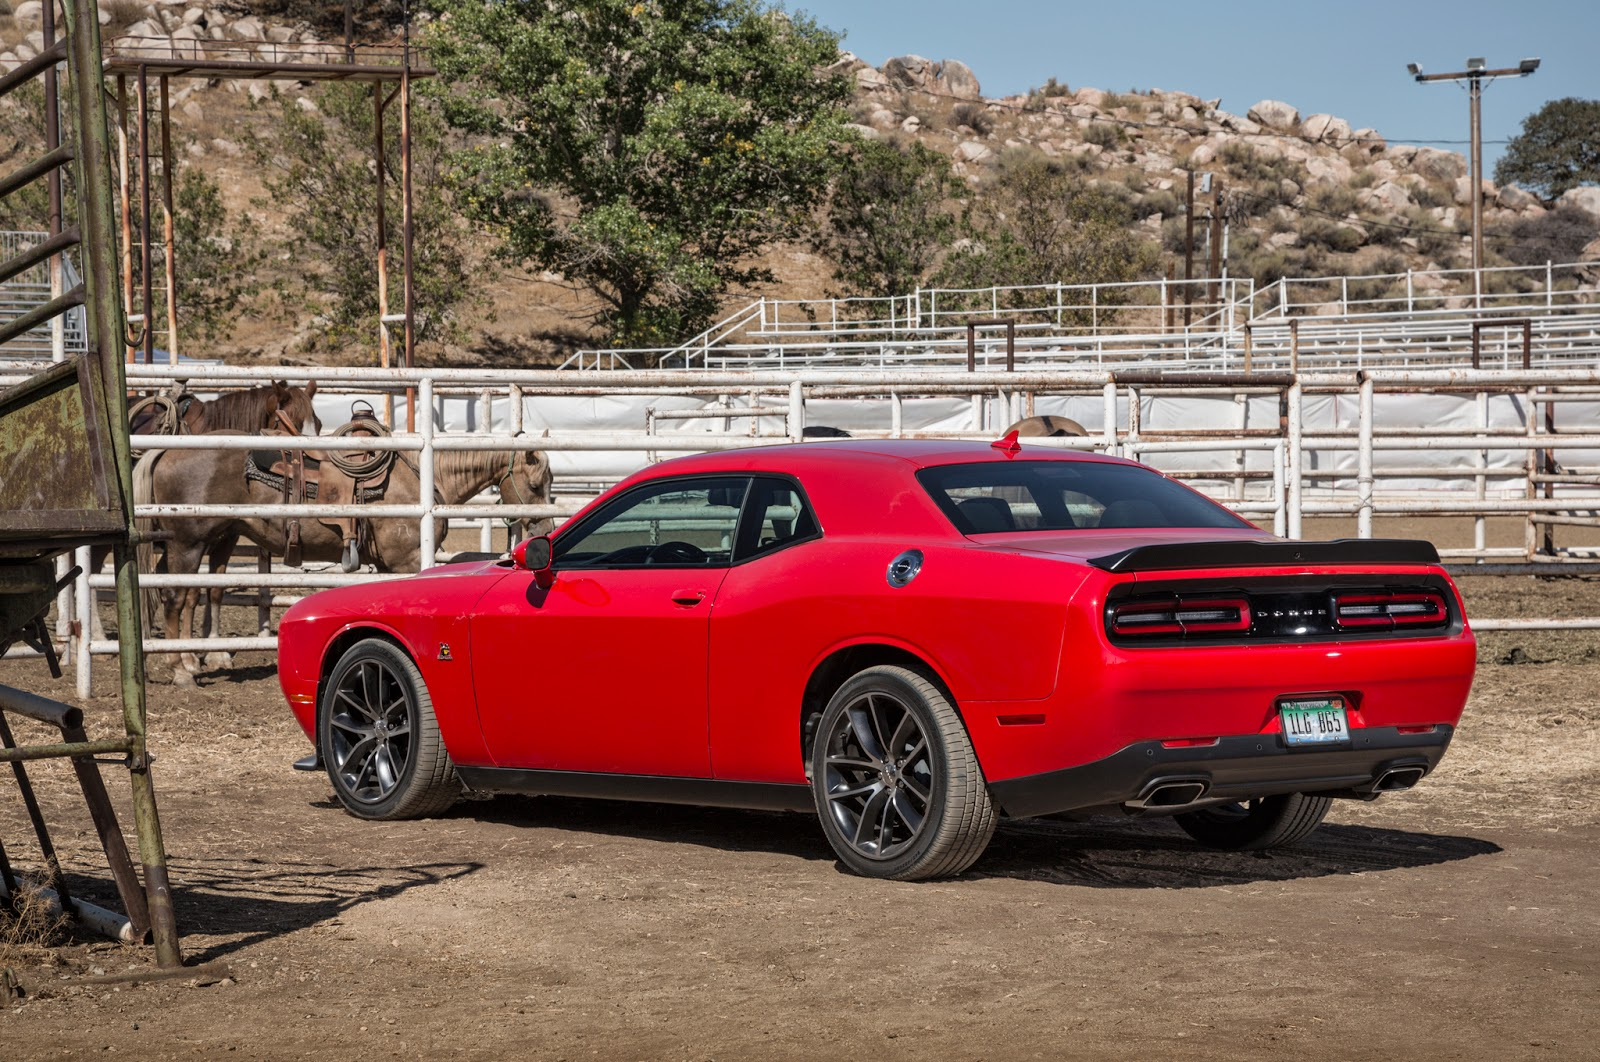 Review 2015 Dodge Challenger R/T Scat Pack 6.4L Manual